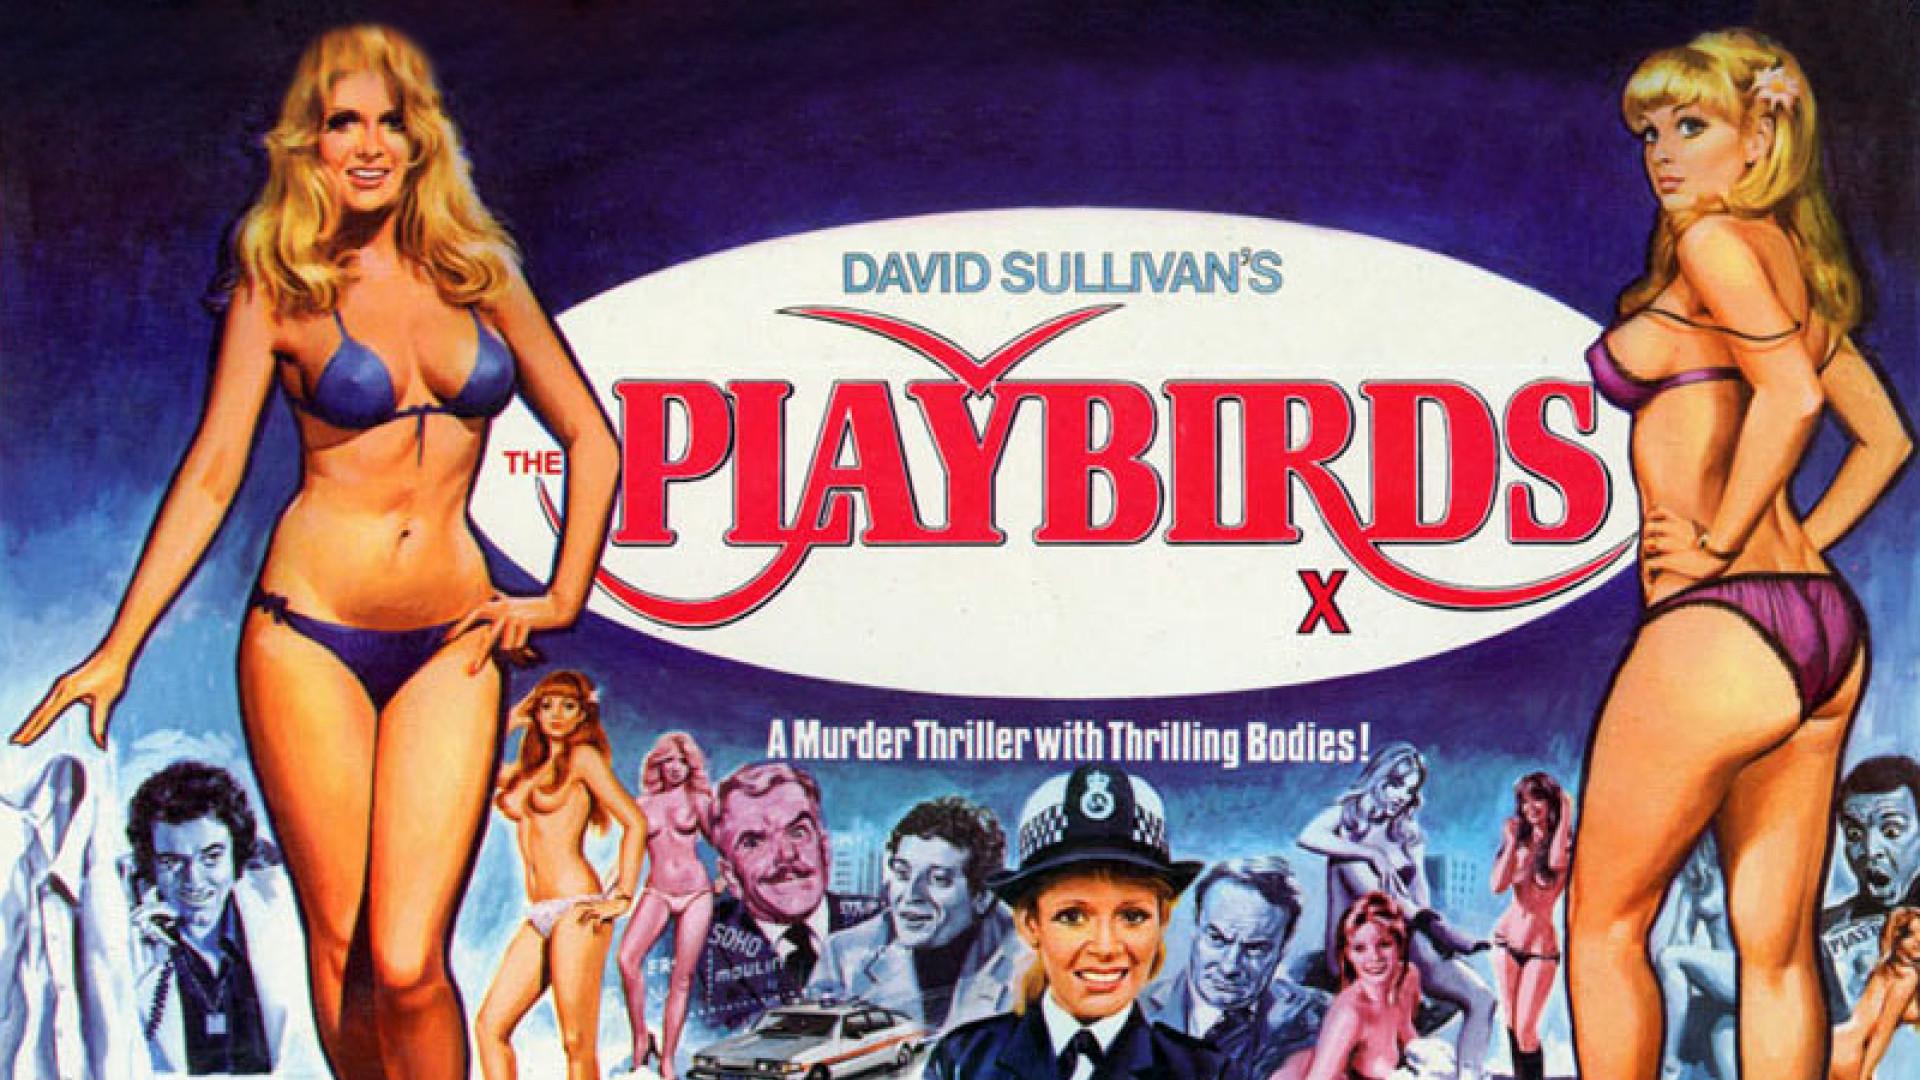 The Playbirds